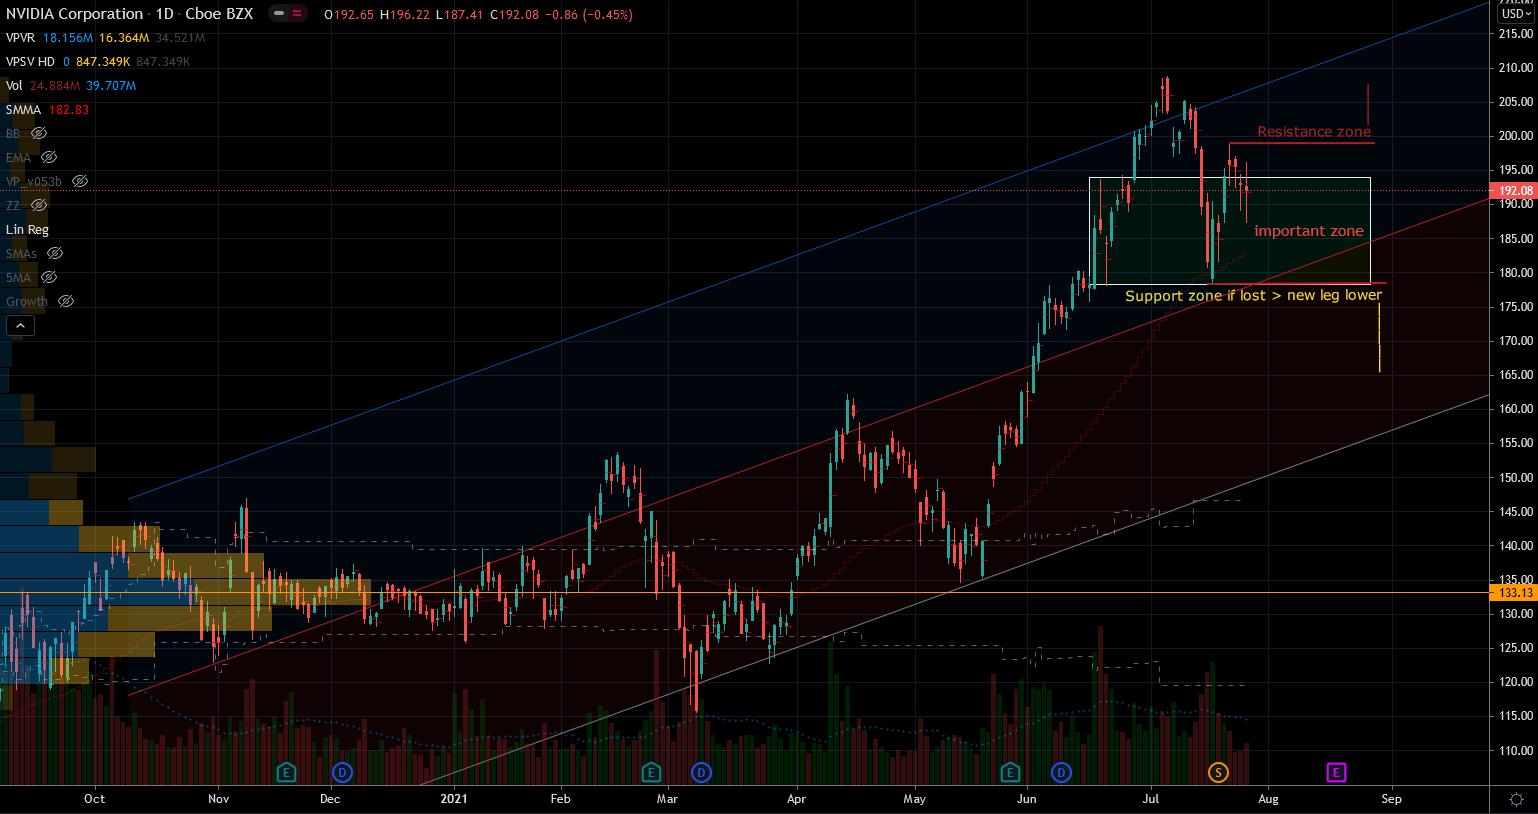 Nvidia (NVDA) Stock Chart Showing Vulnerabe Setup